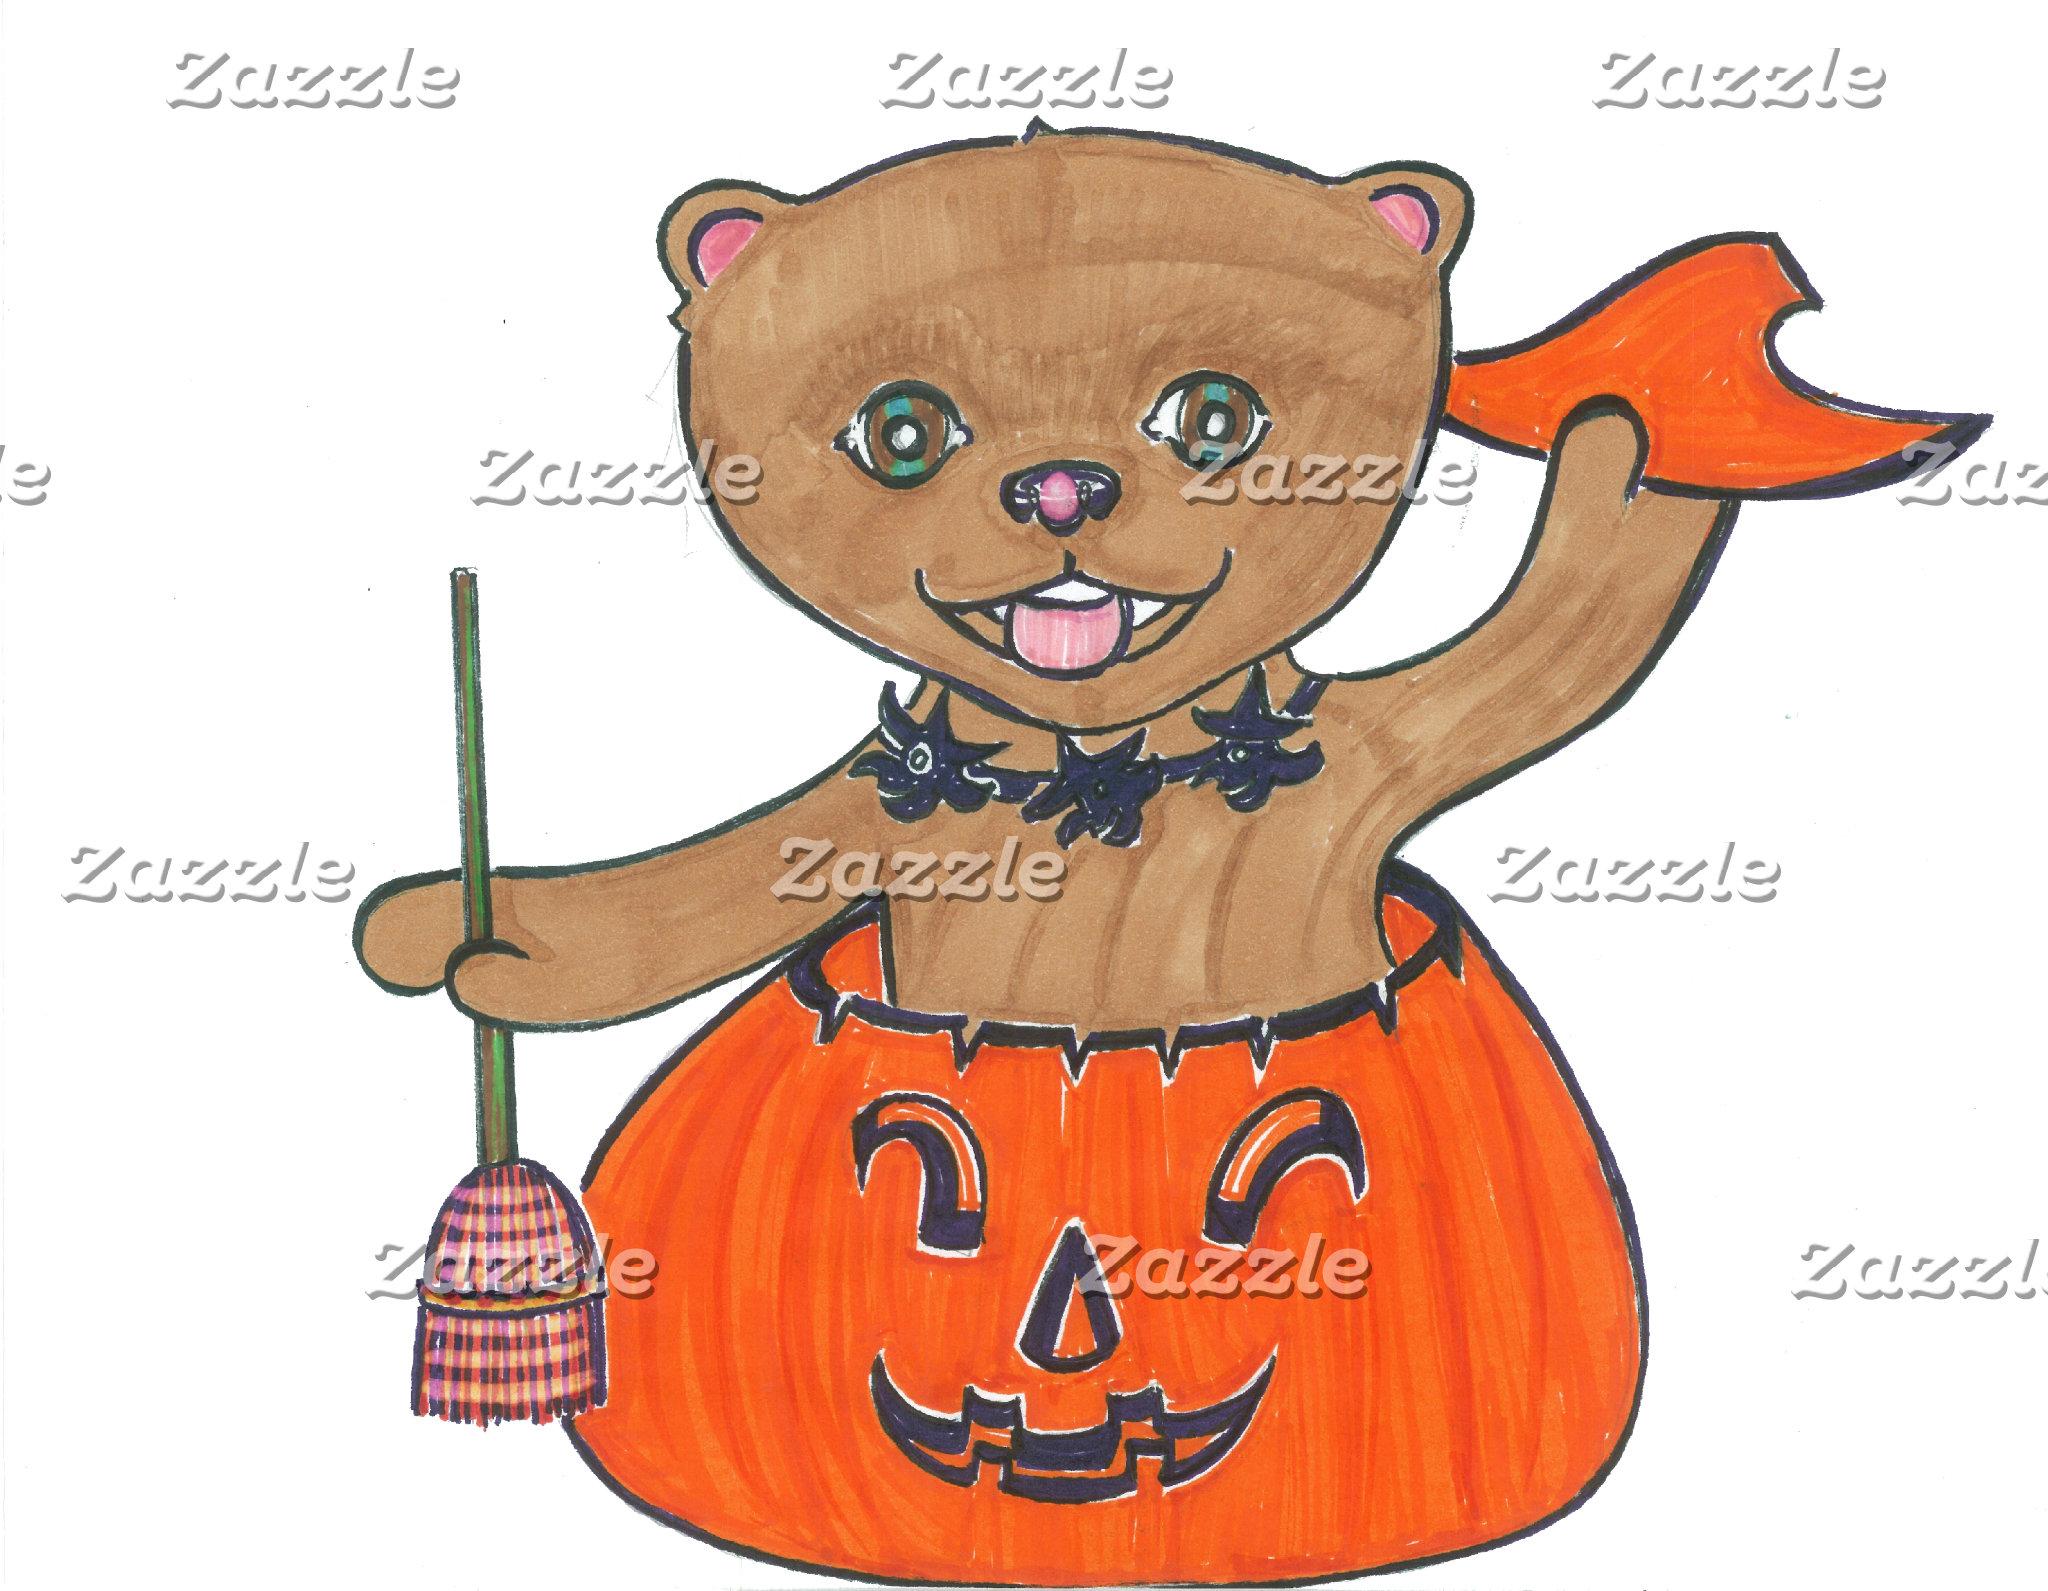 Boo! Pomeranian Pop Up Halloween